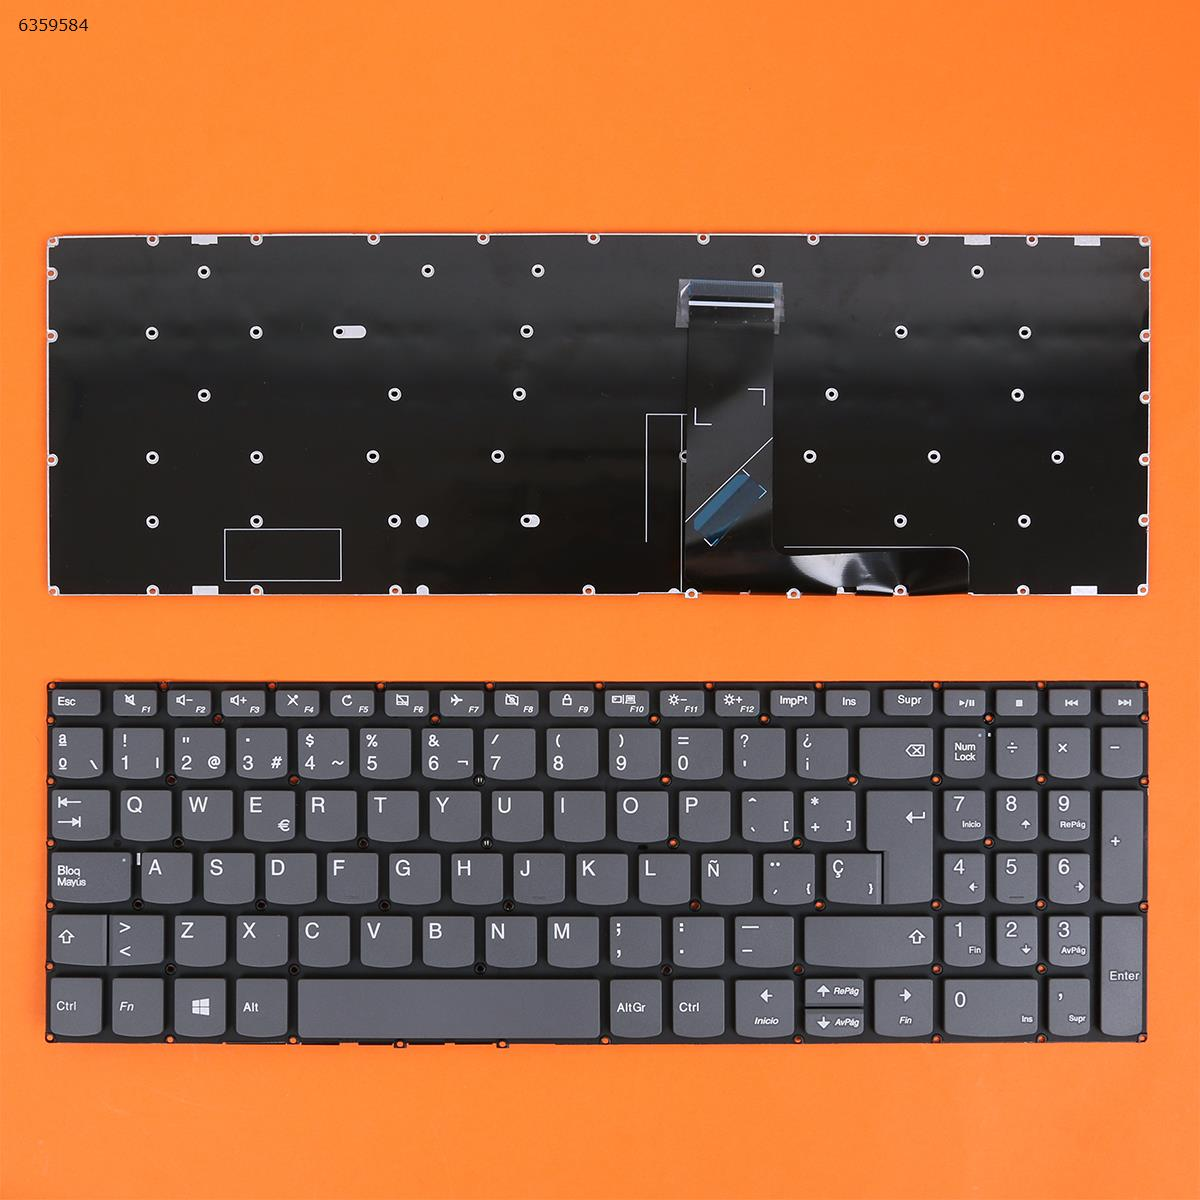 SP раскладка для испанского языка новая Замена клавиатура для ноутбука Lenovo Ideapad 330-15IKB 330-17IKB V330-15ISK V330-15IKB S340-15IIL ноутбук